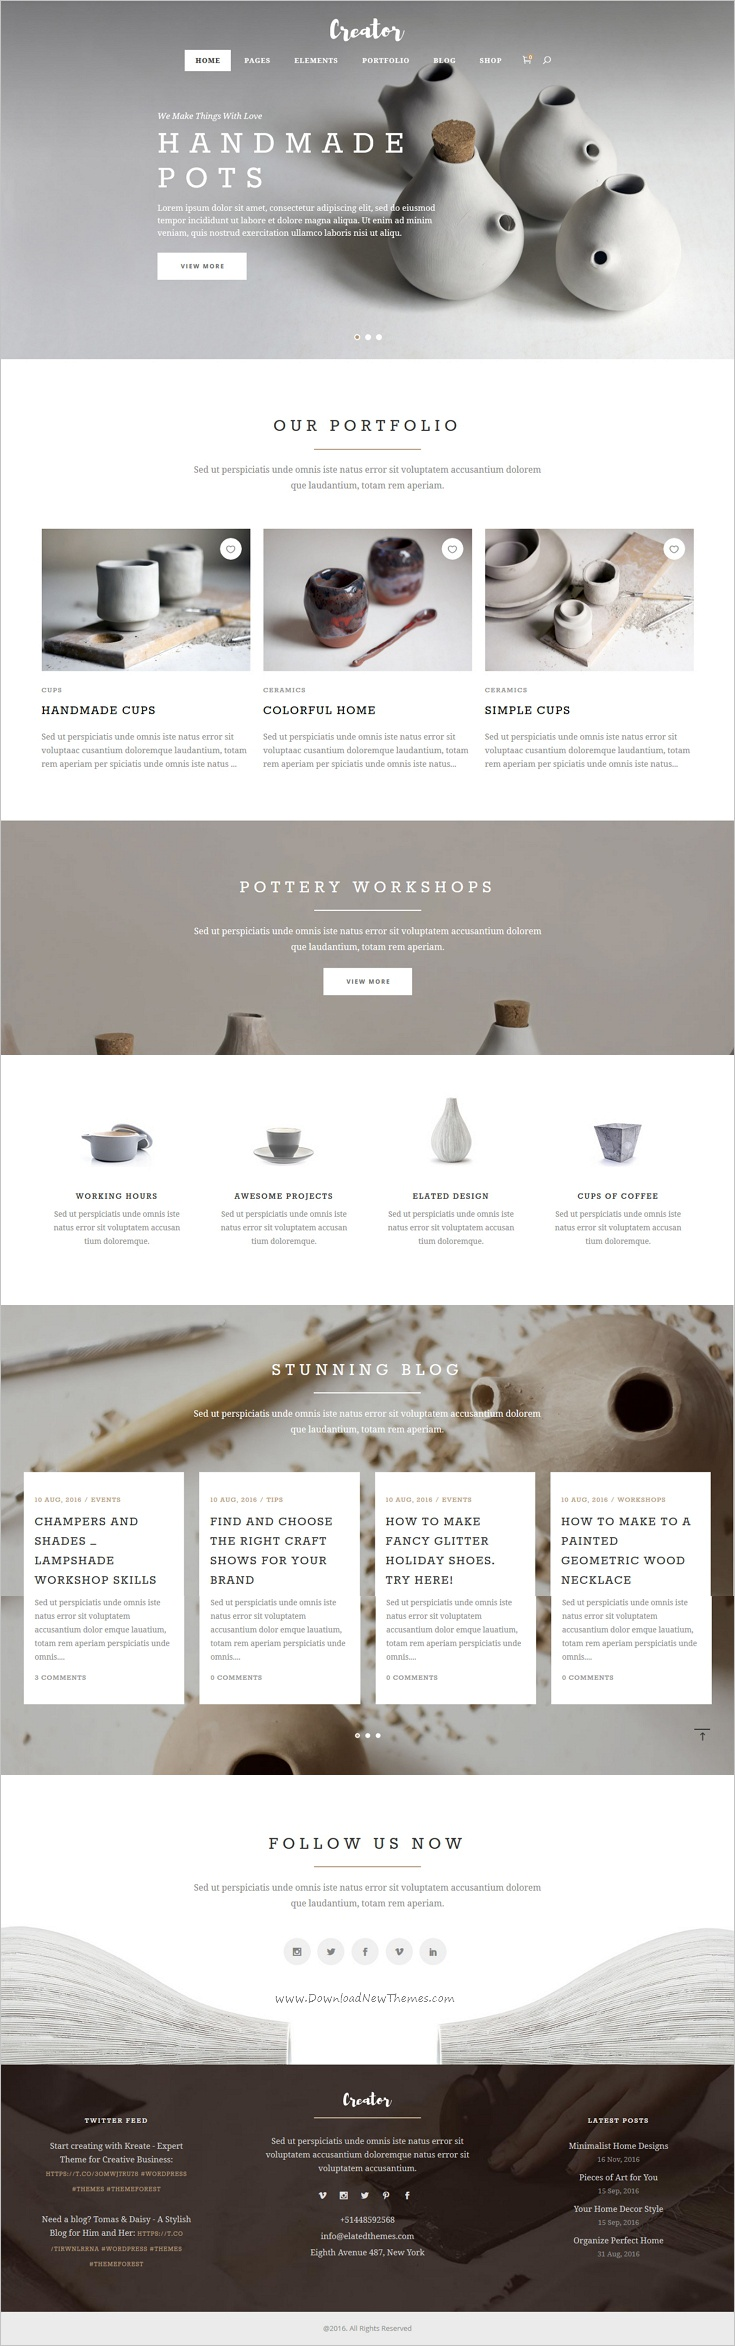 Creator Is A Wonderful Responsive Wordpress Theme For Handmade